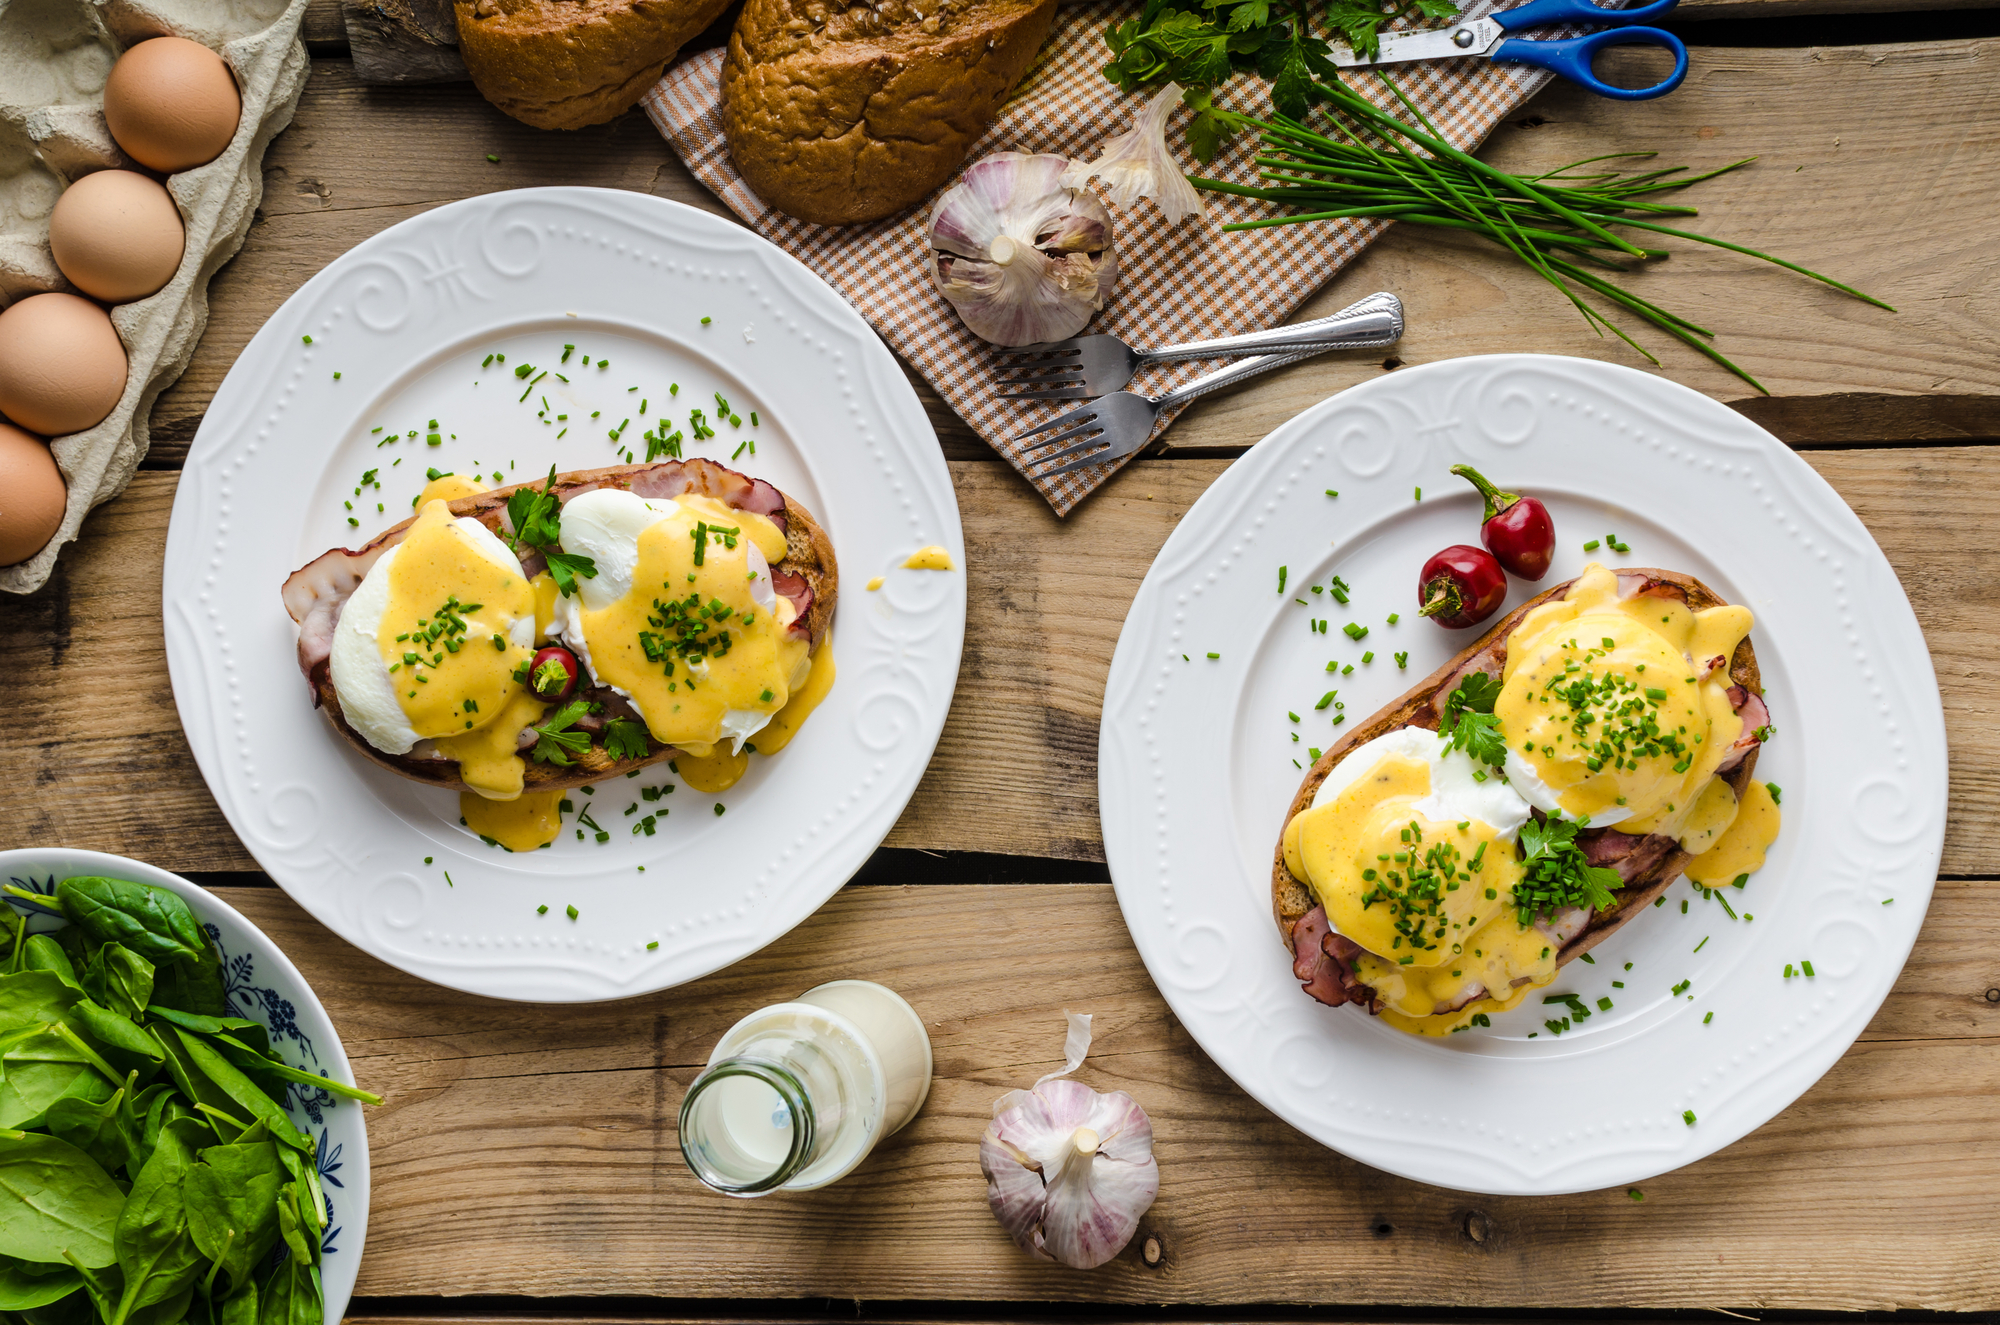 Яйца Бенедикт на завтрак: пошаговый рецепт